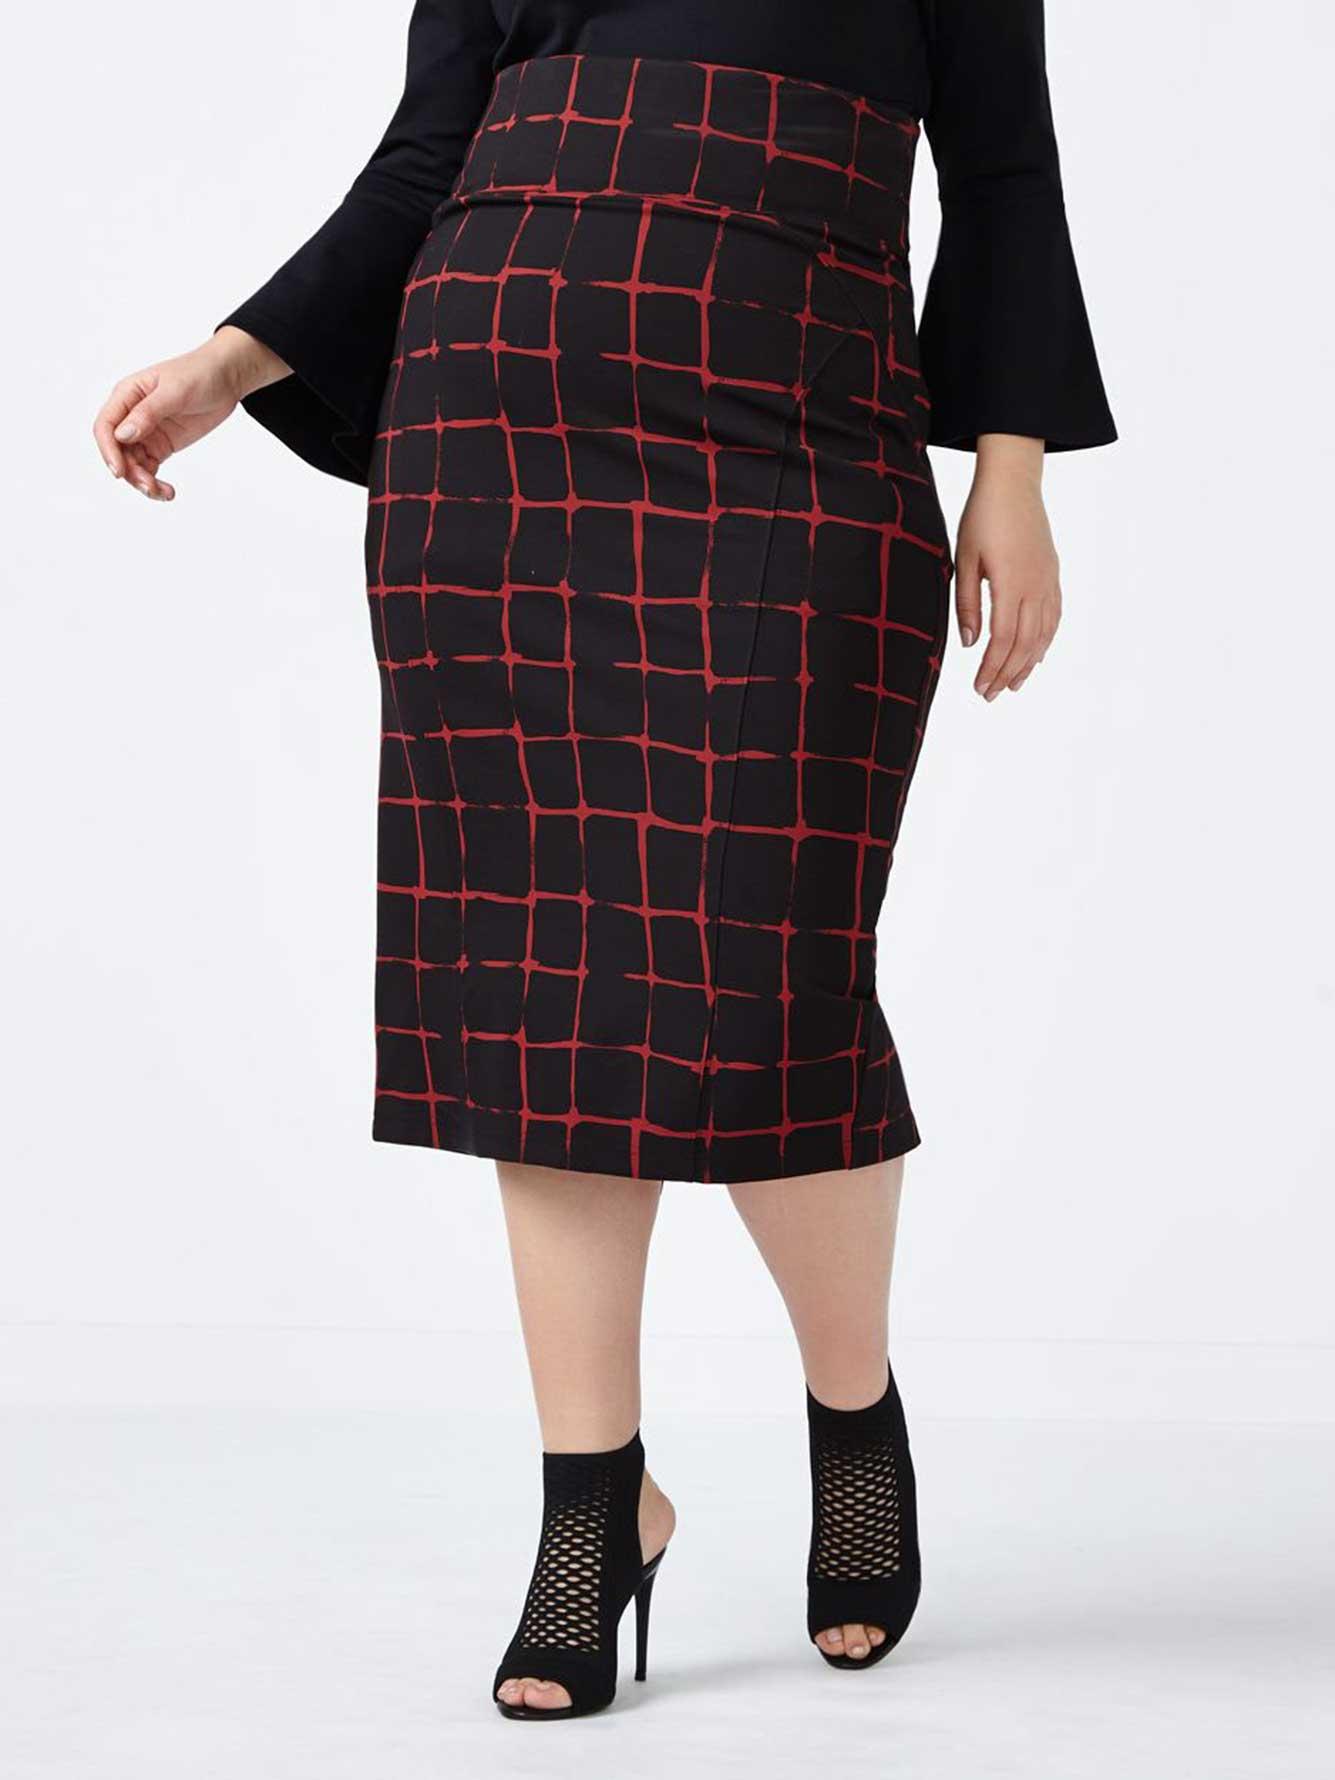 b6bc1ed005 Printed Pencil Skirt - MELISSA McCARTHY | Penningtons